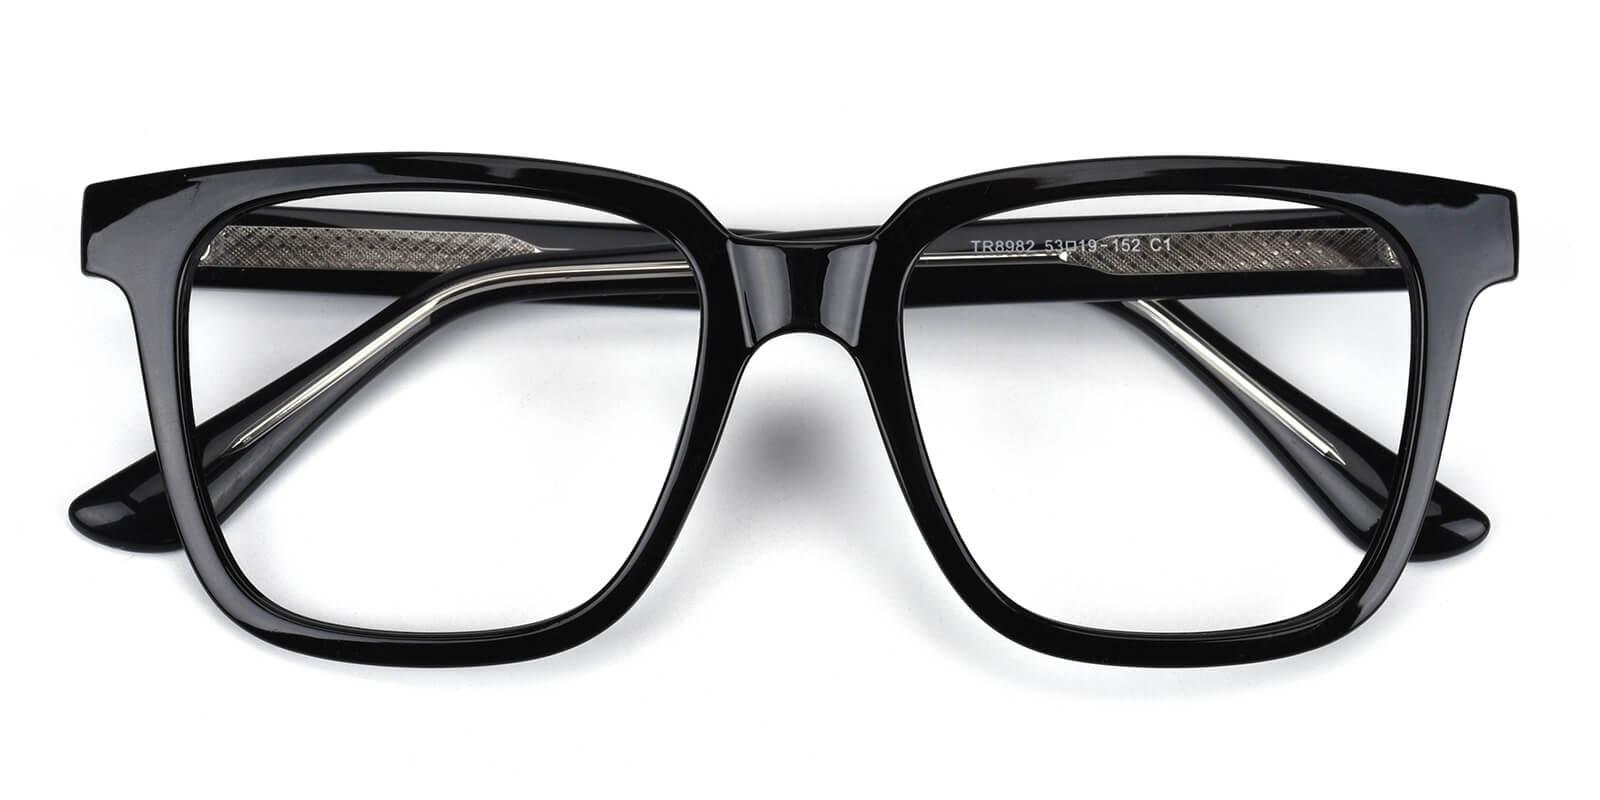 Jadeite-Black-Square-Acetate-Eyeglasses-detail